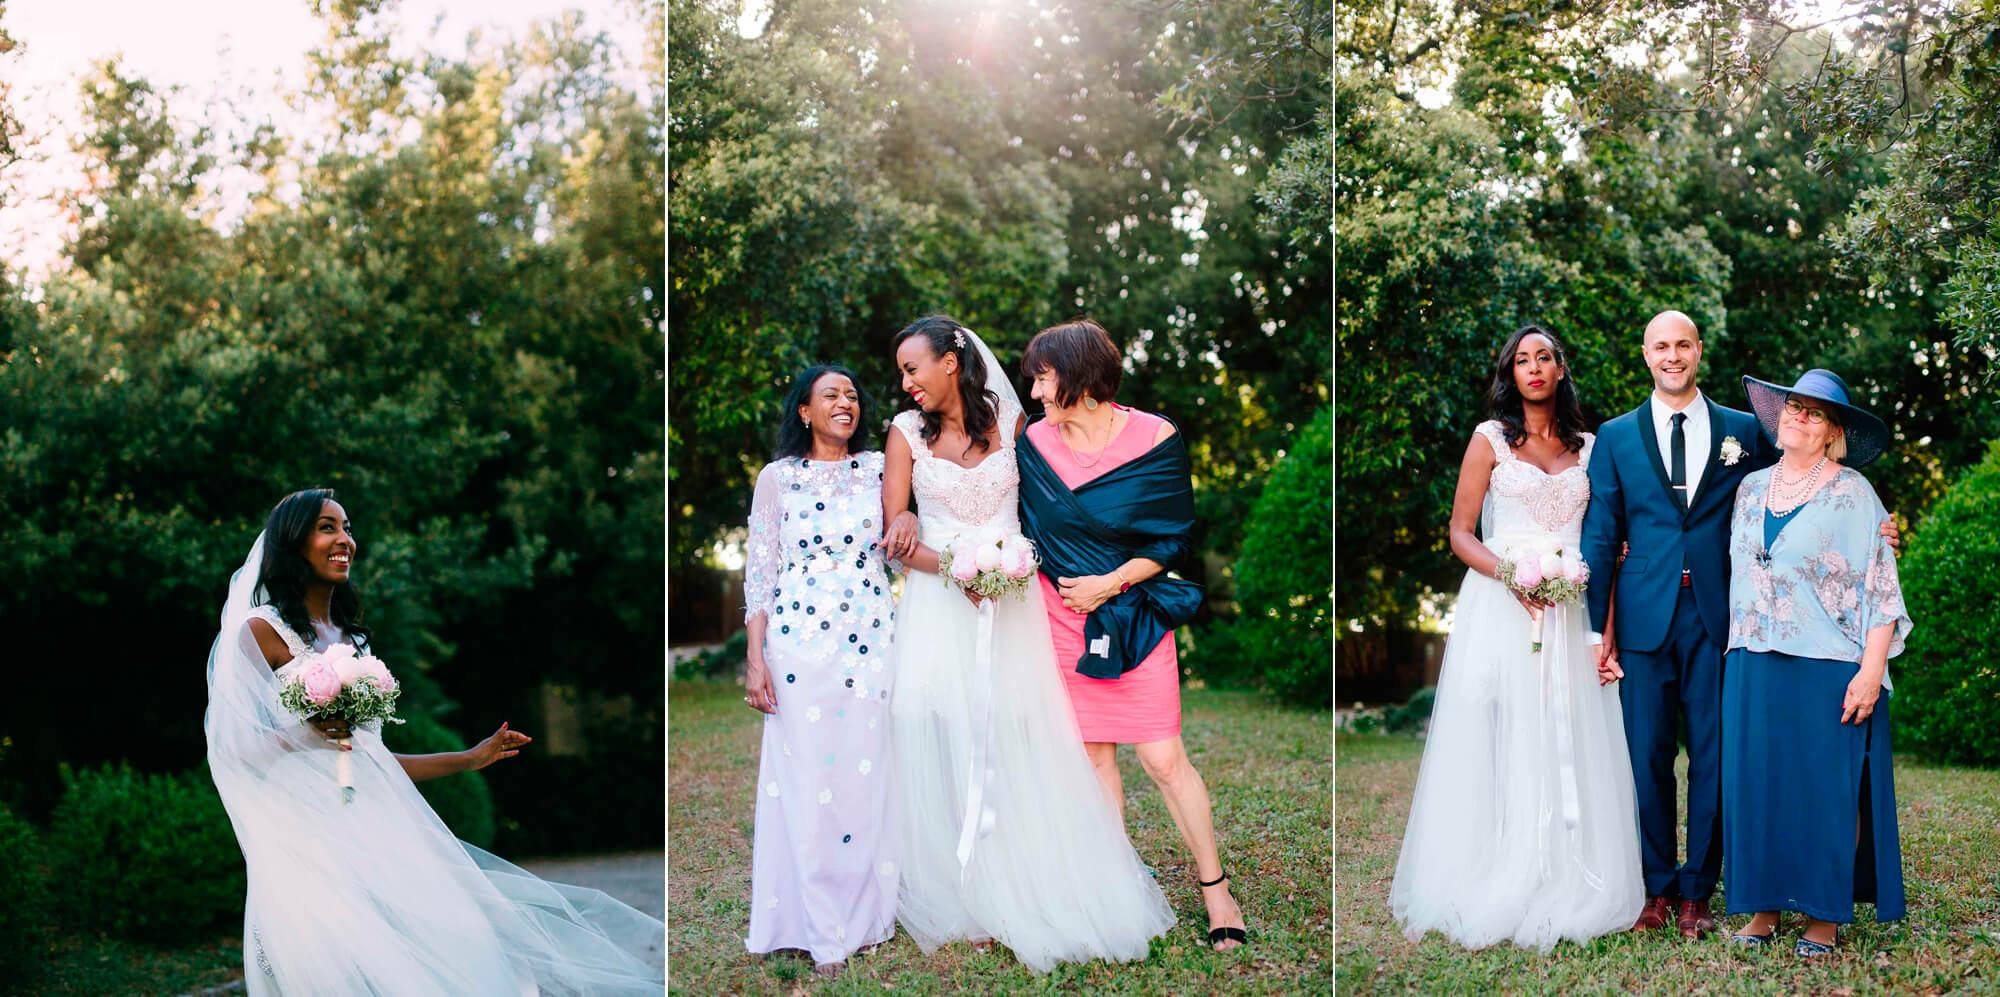 077-sorrento-wedding-photographer.jpg